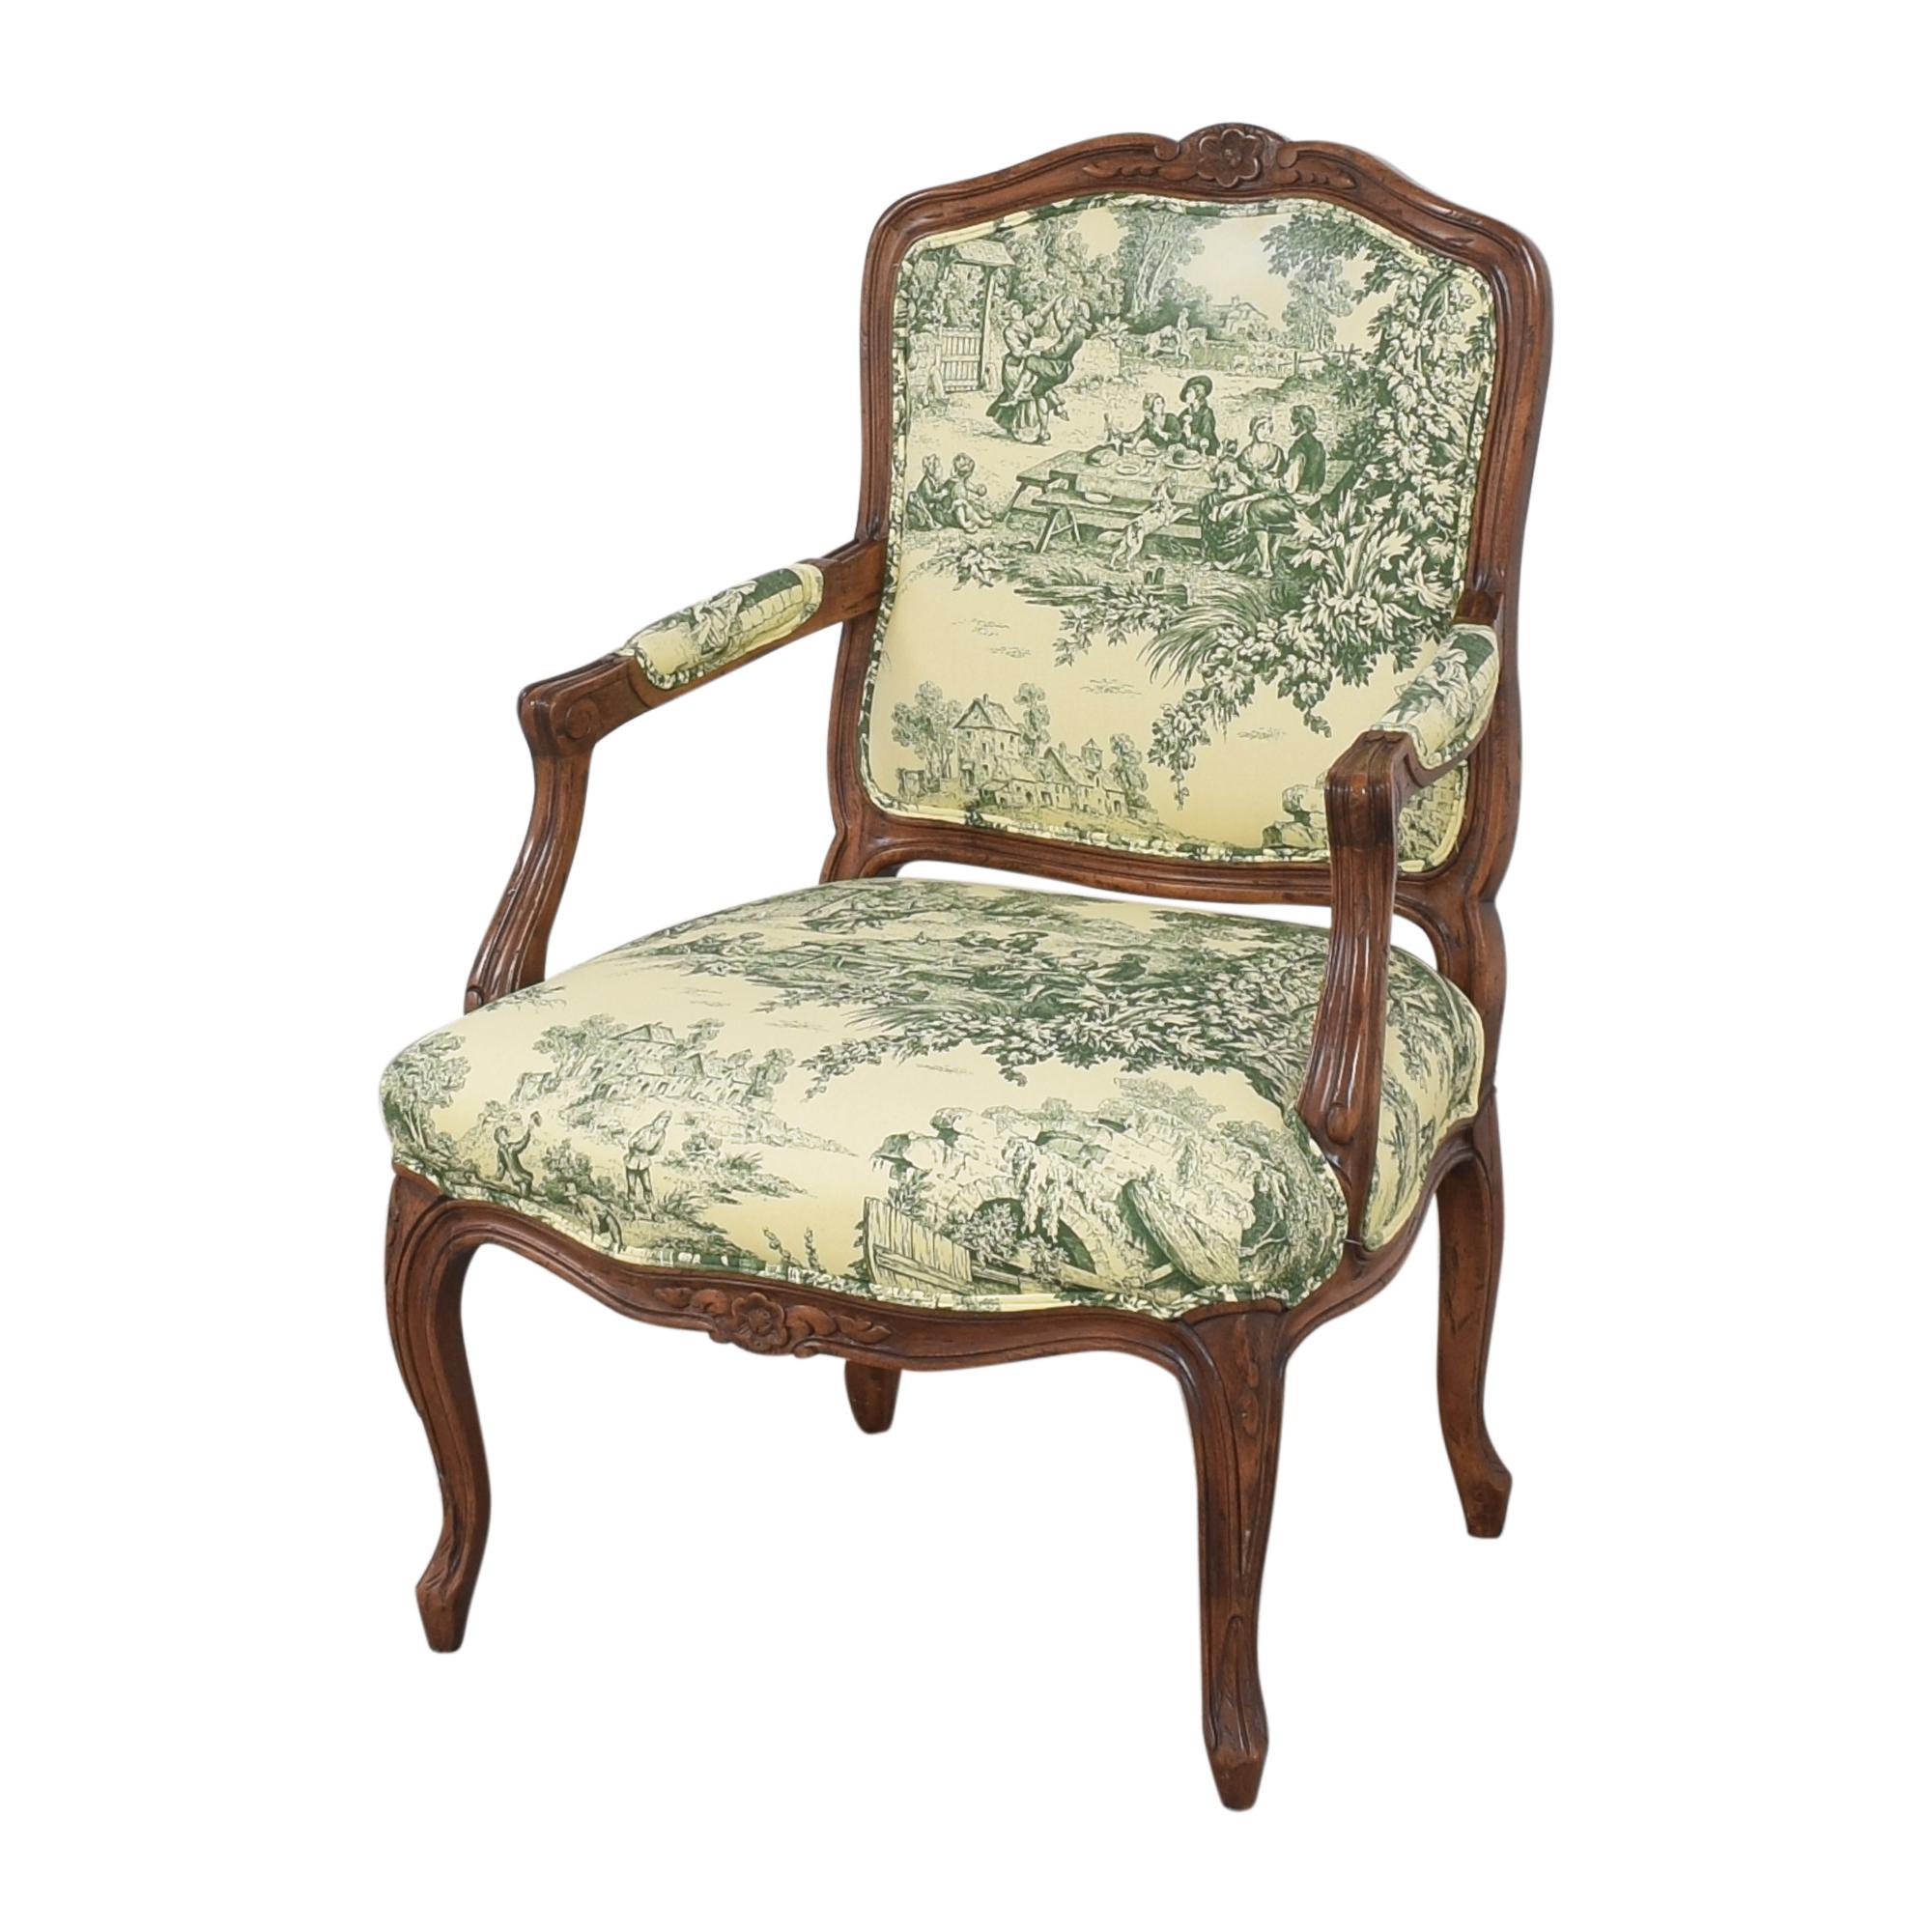 Fremarc Designs Fremarc Designs Upholstered Arm Chair used